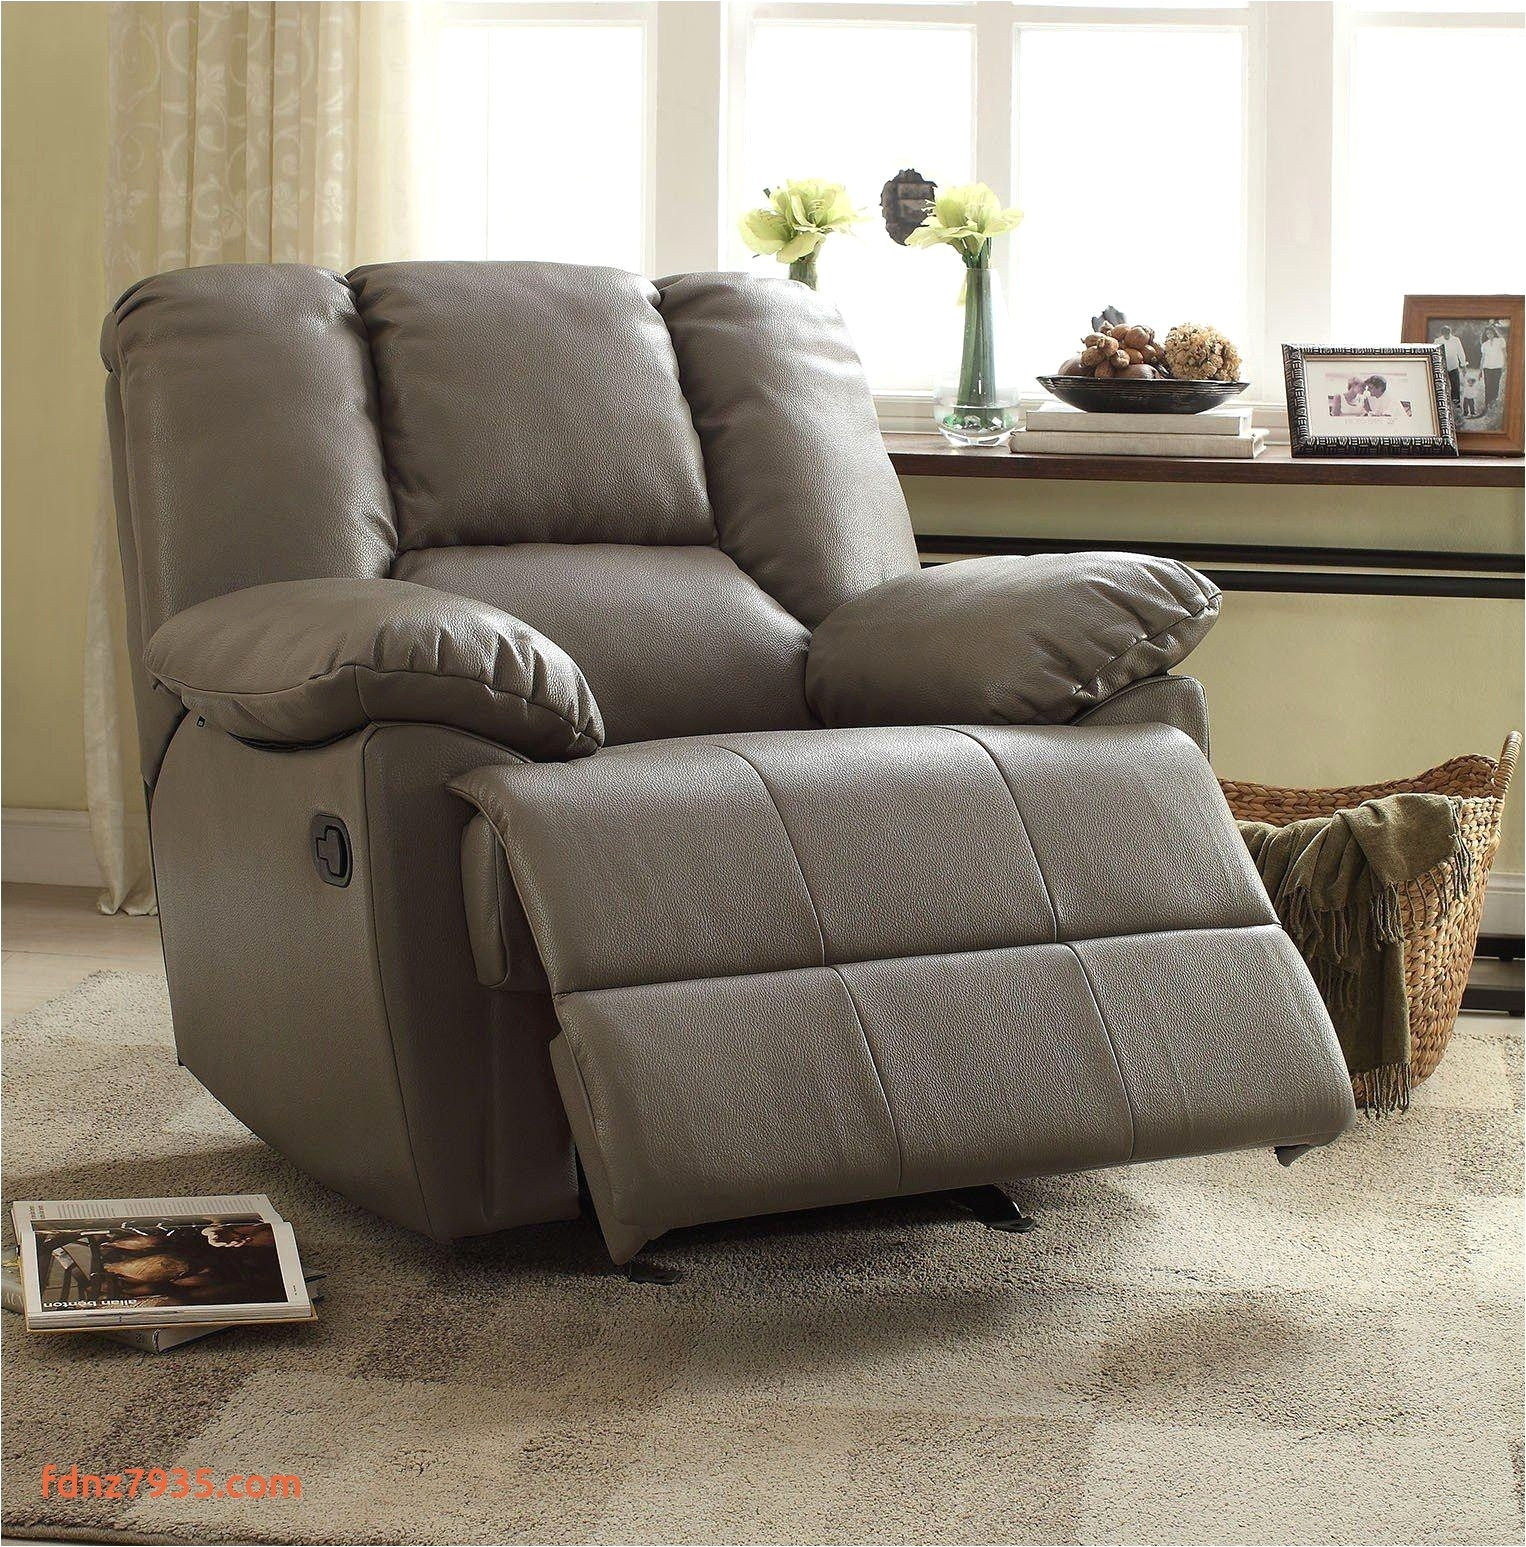 brown reclining sofa new furniture sleeper loveseat inspirational wicker outdoor sofa 0d